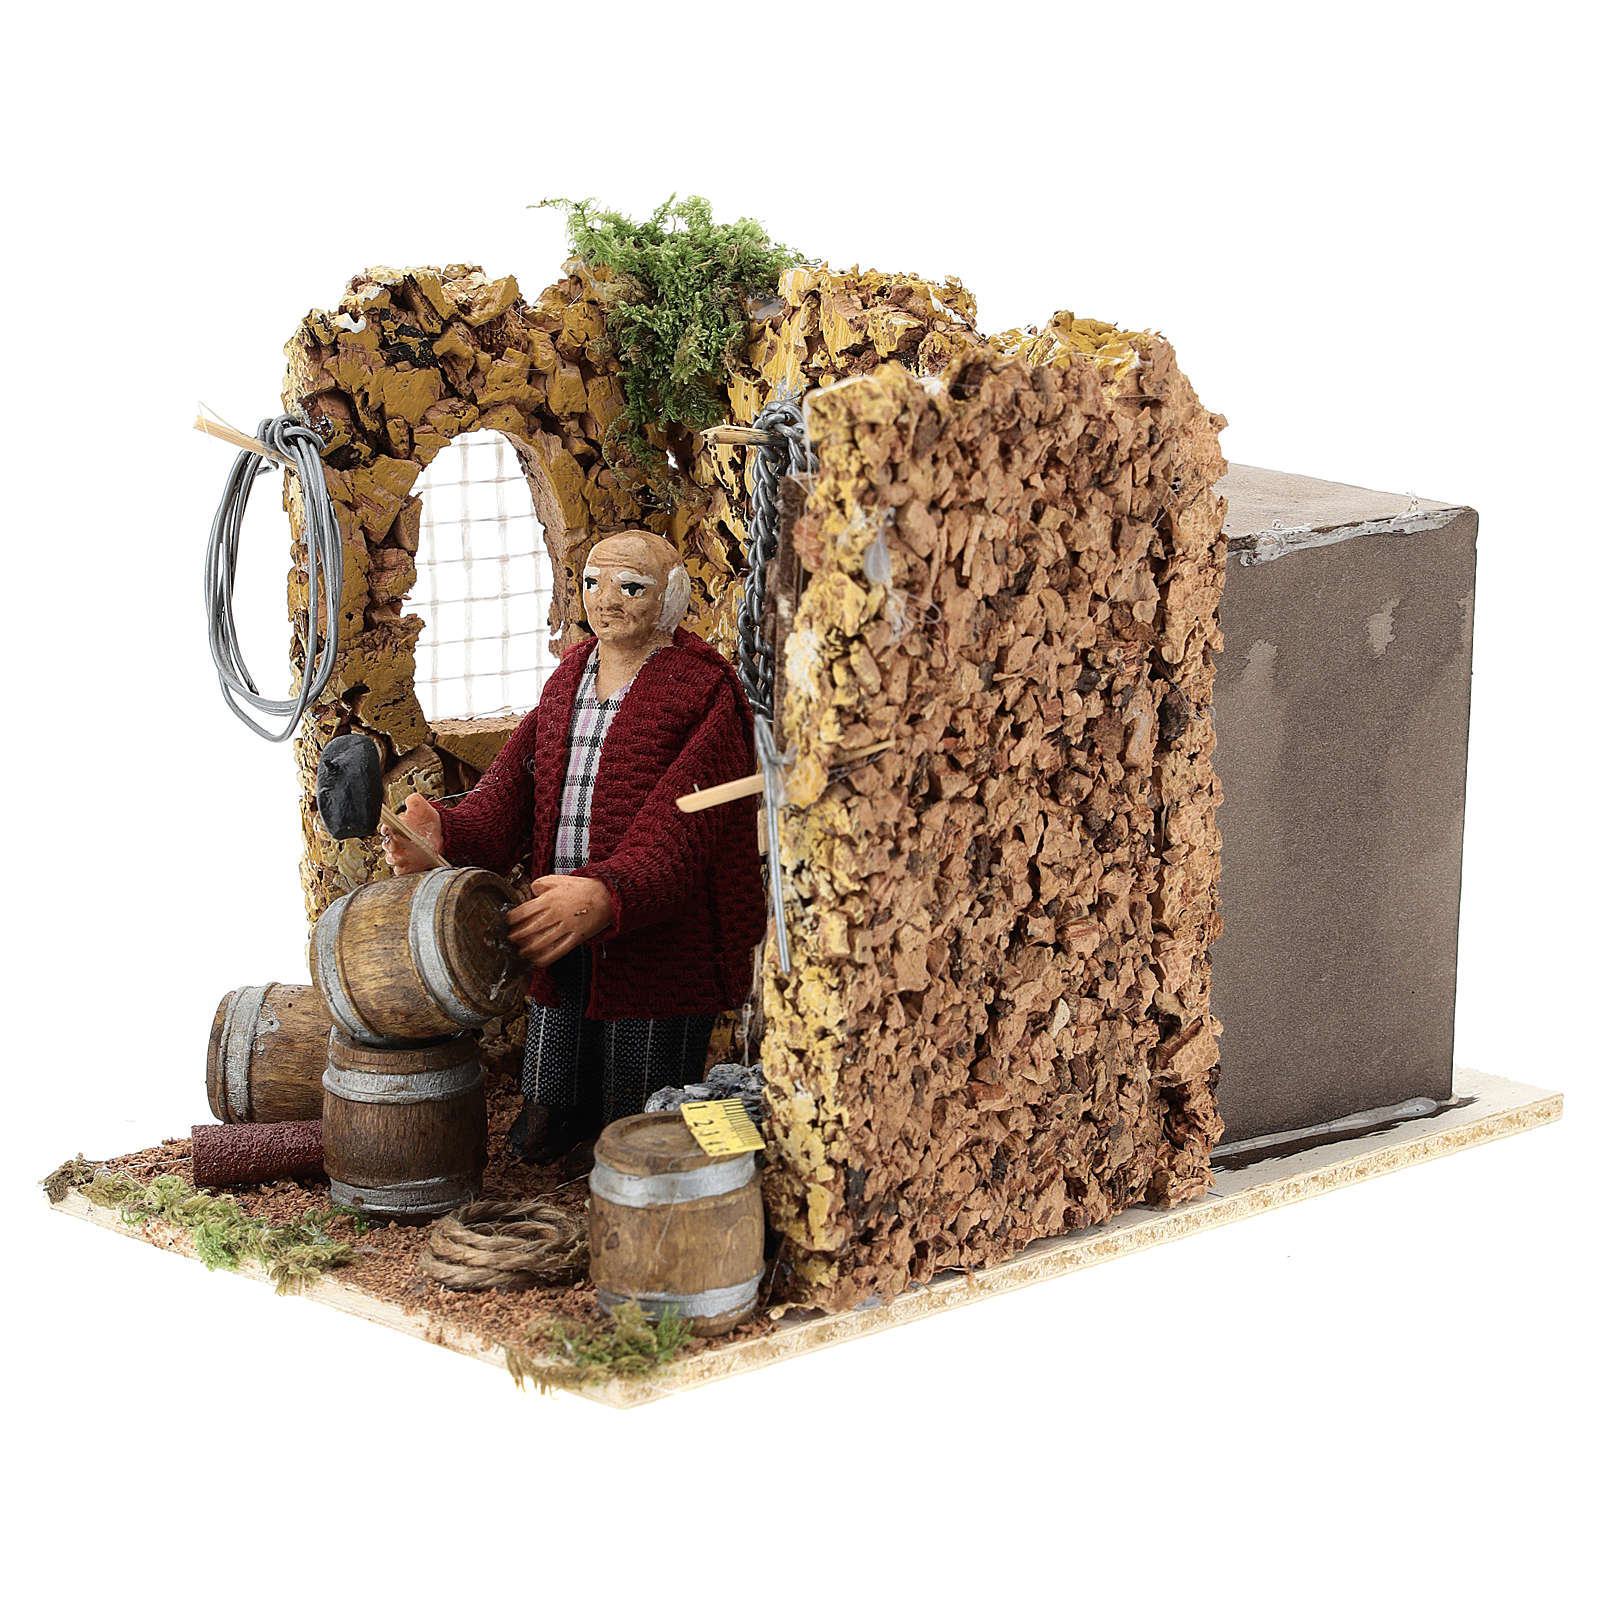 Moving shopkeeper for Neapolitan Nativity Scene of 8 cm 4